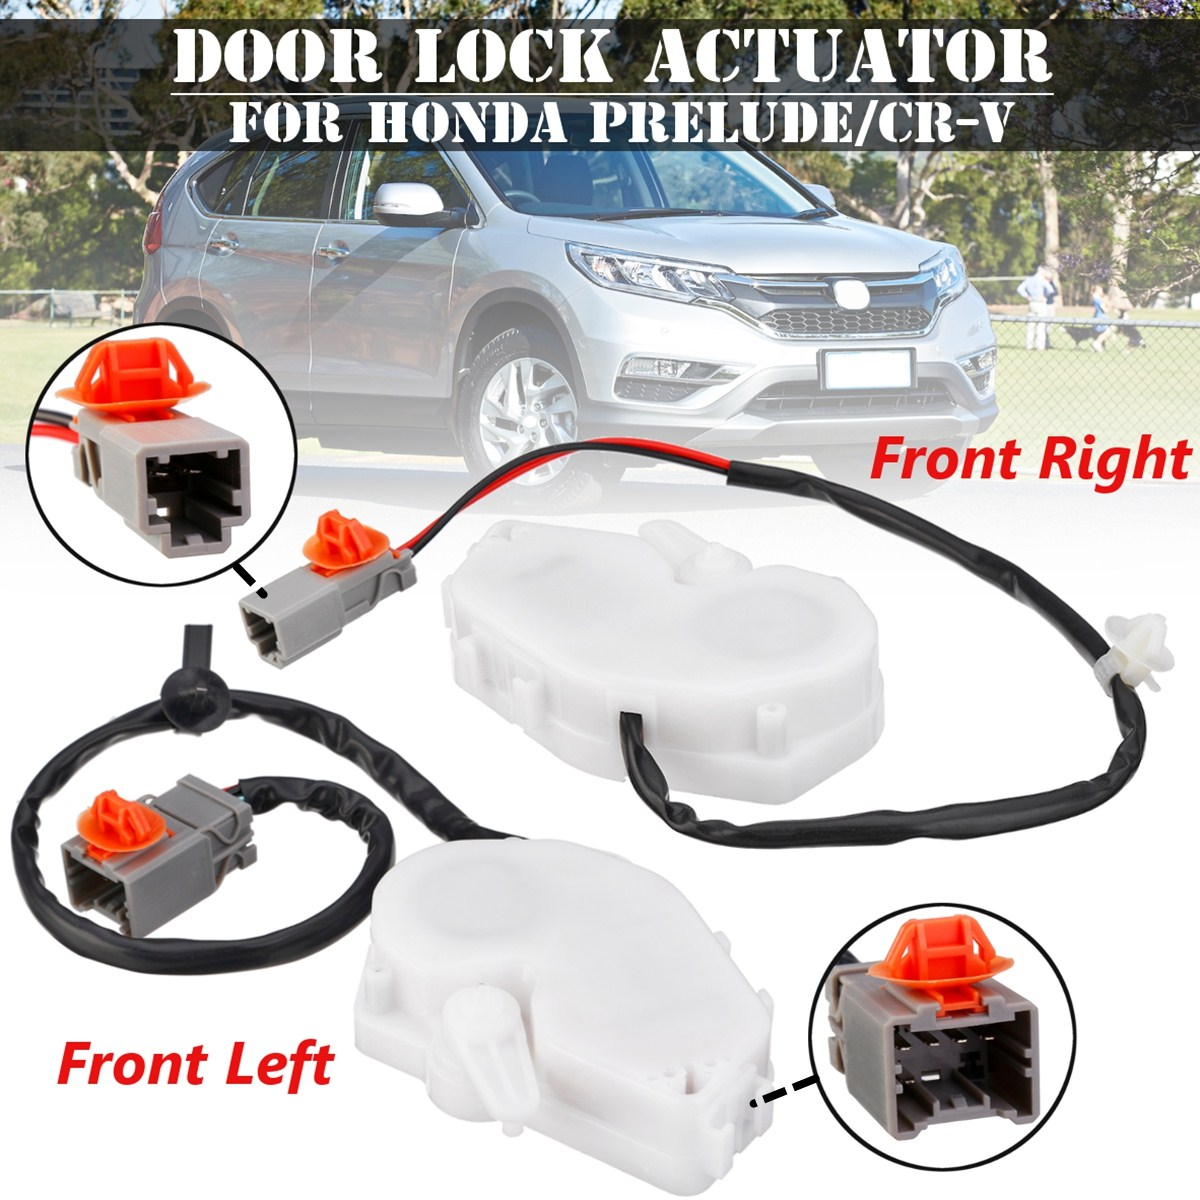 Honda Prelude 1998 Advantage Front Non: Car Front Right Left Power Door Lock Actuator For Honda